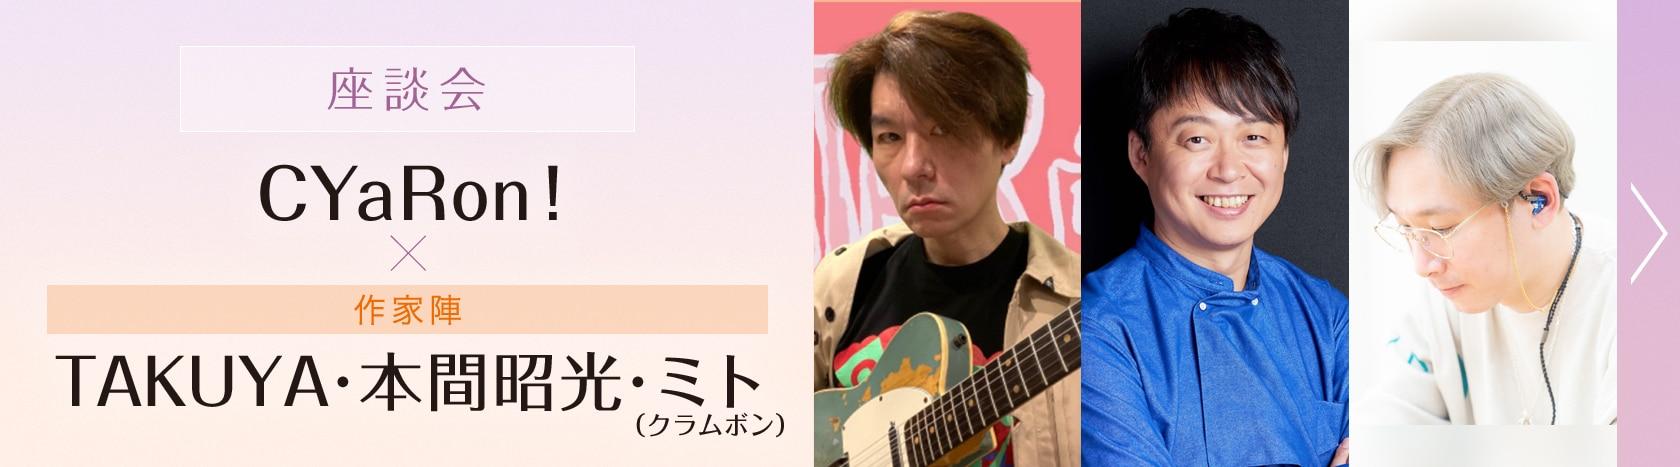 CYaRon!×作家陣 TAKUYA、本間昭光、ミト(クラムボン)座談会